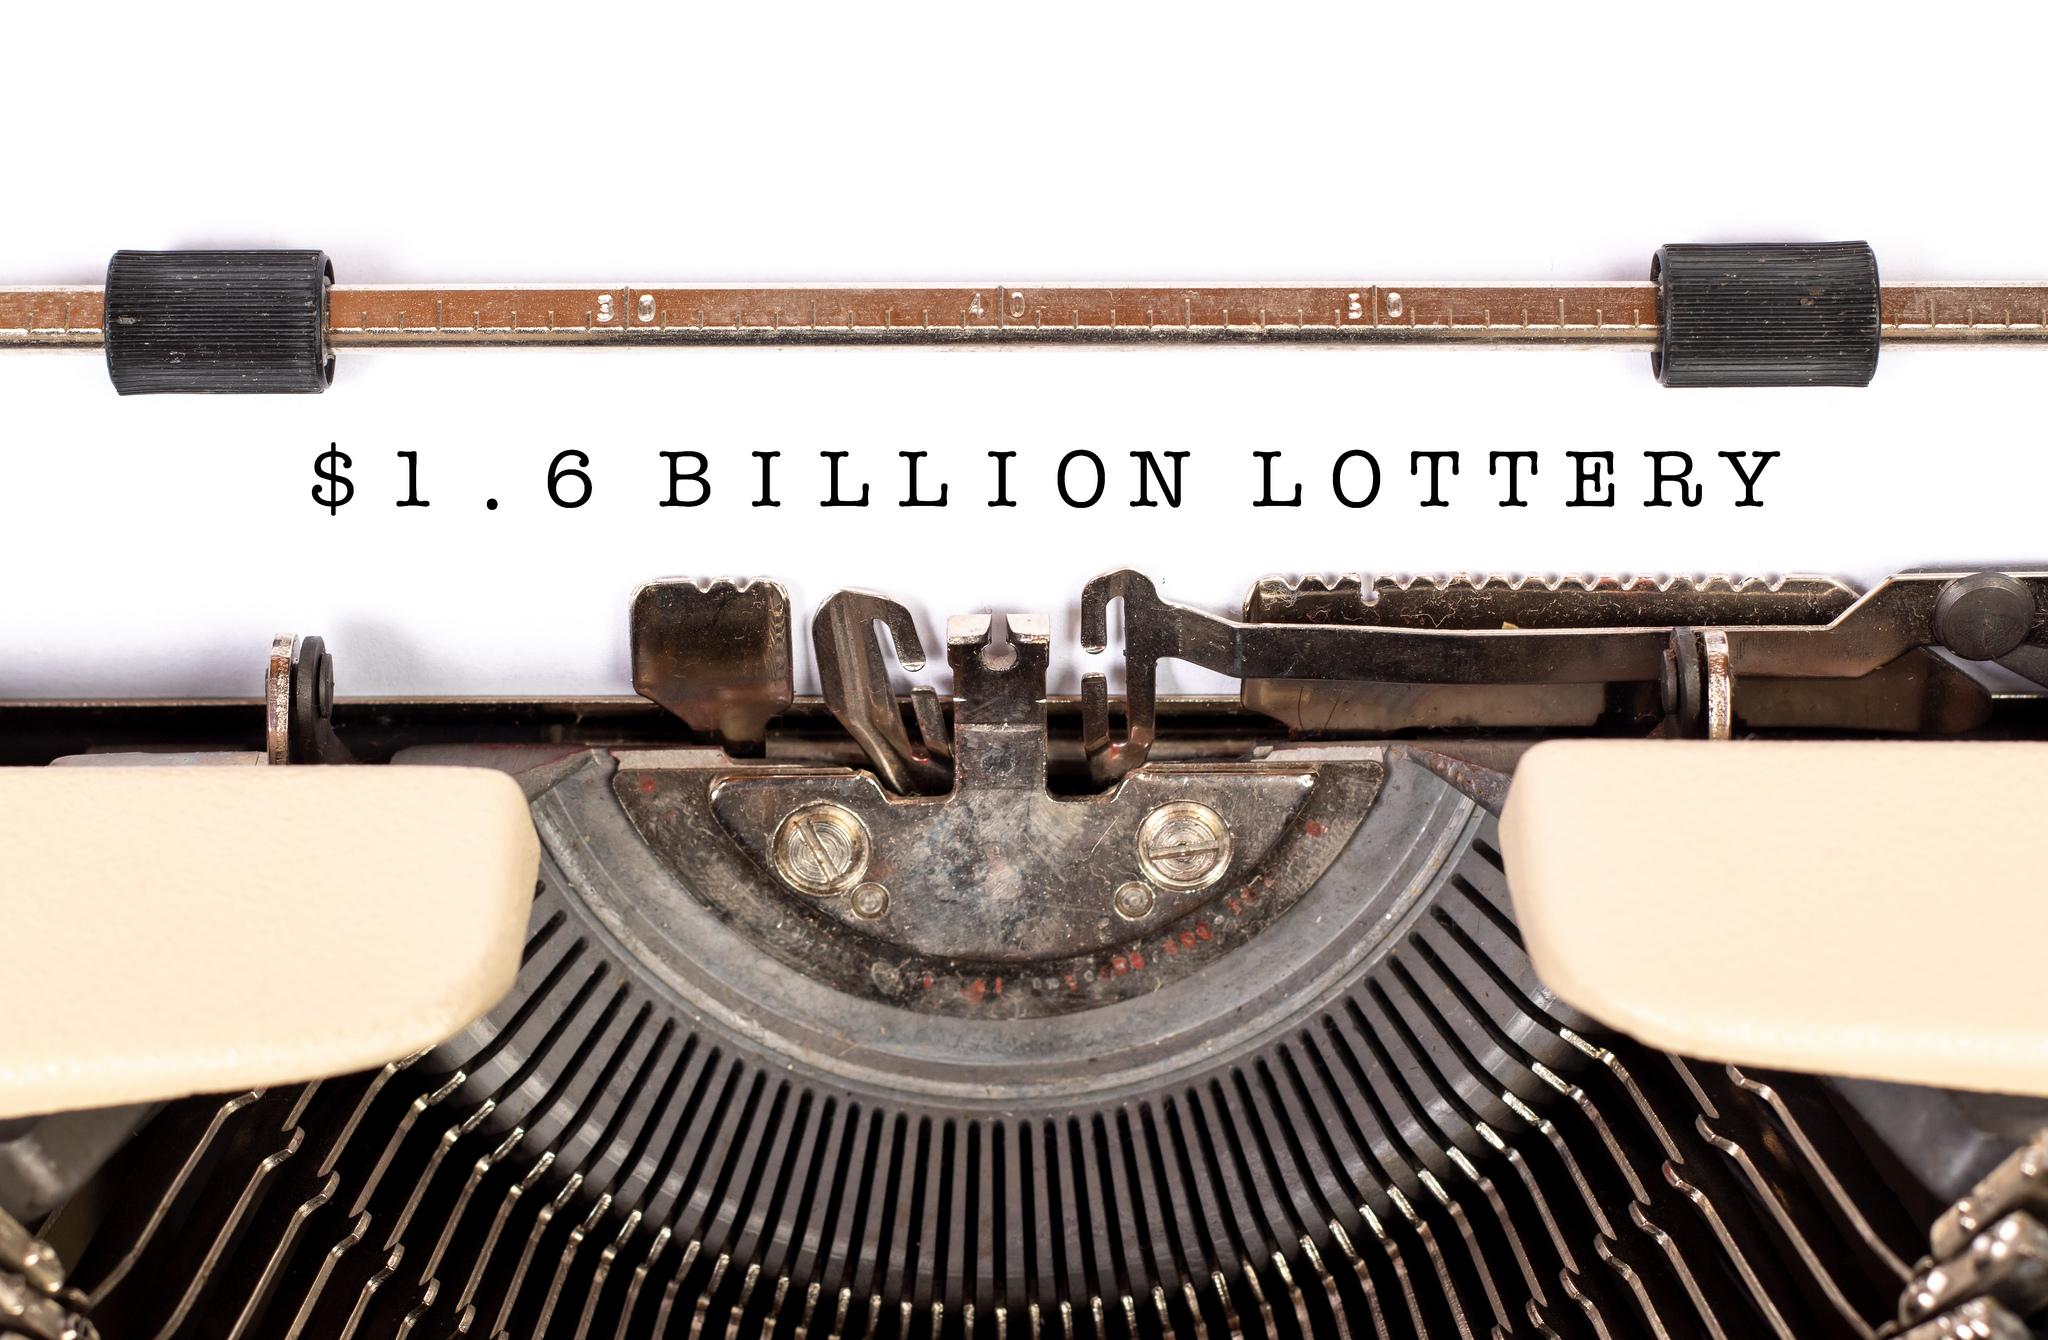 Victor submits claim for $1.5 billion Mega Millions jackpot